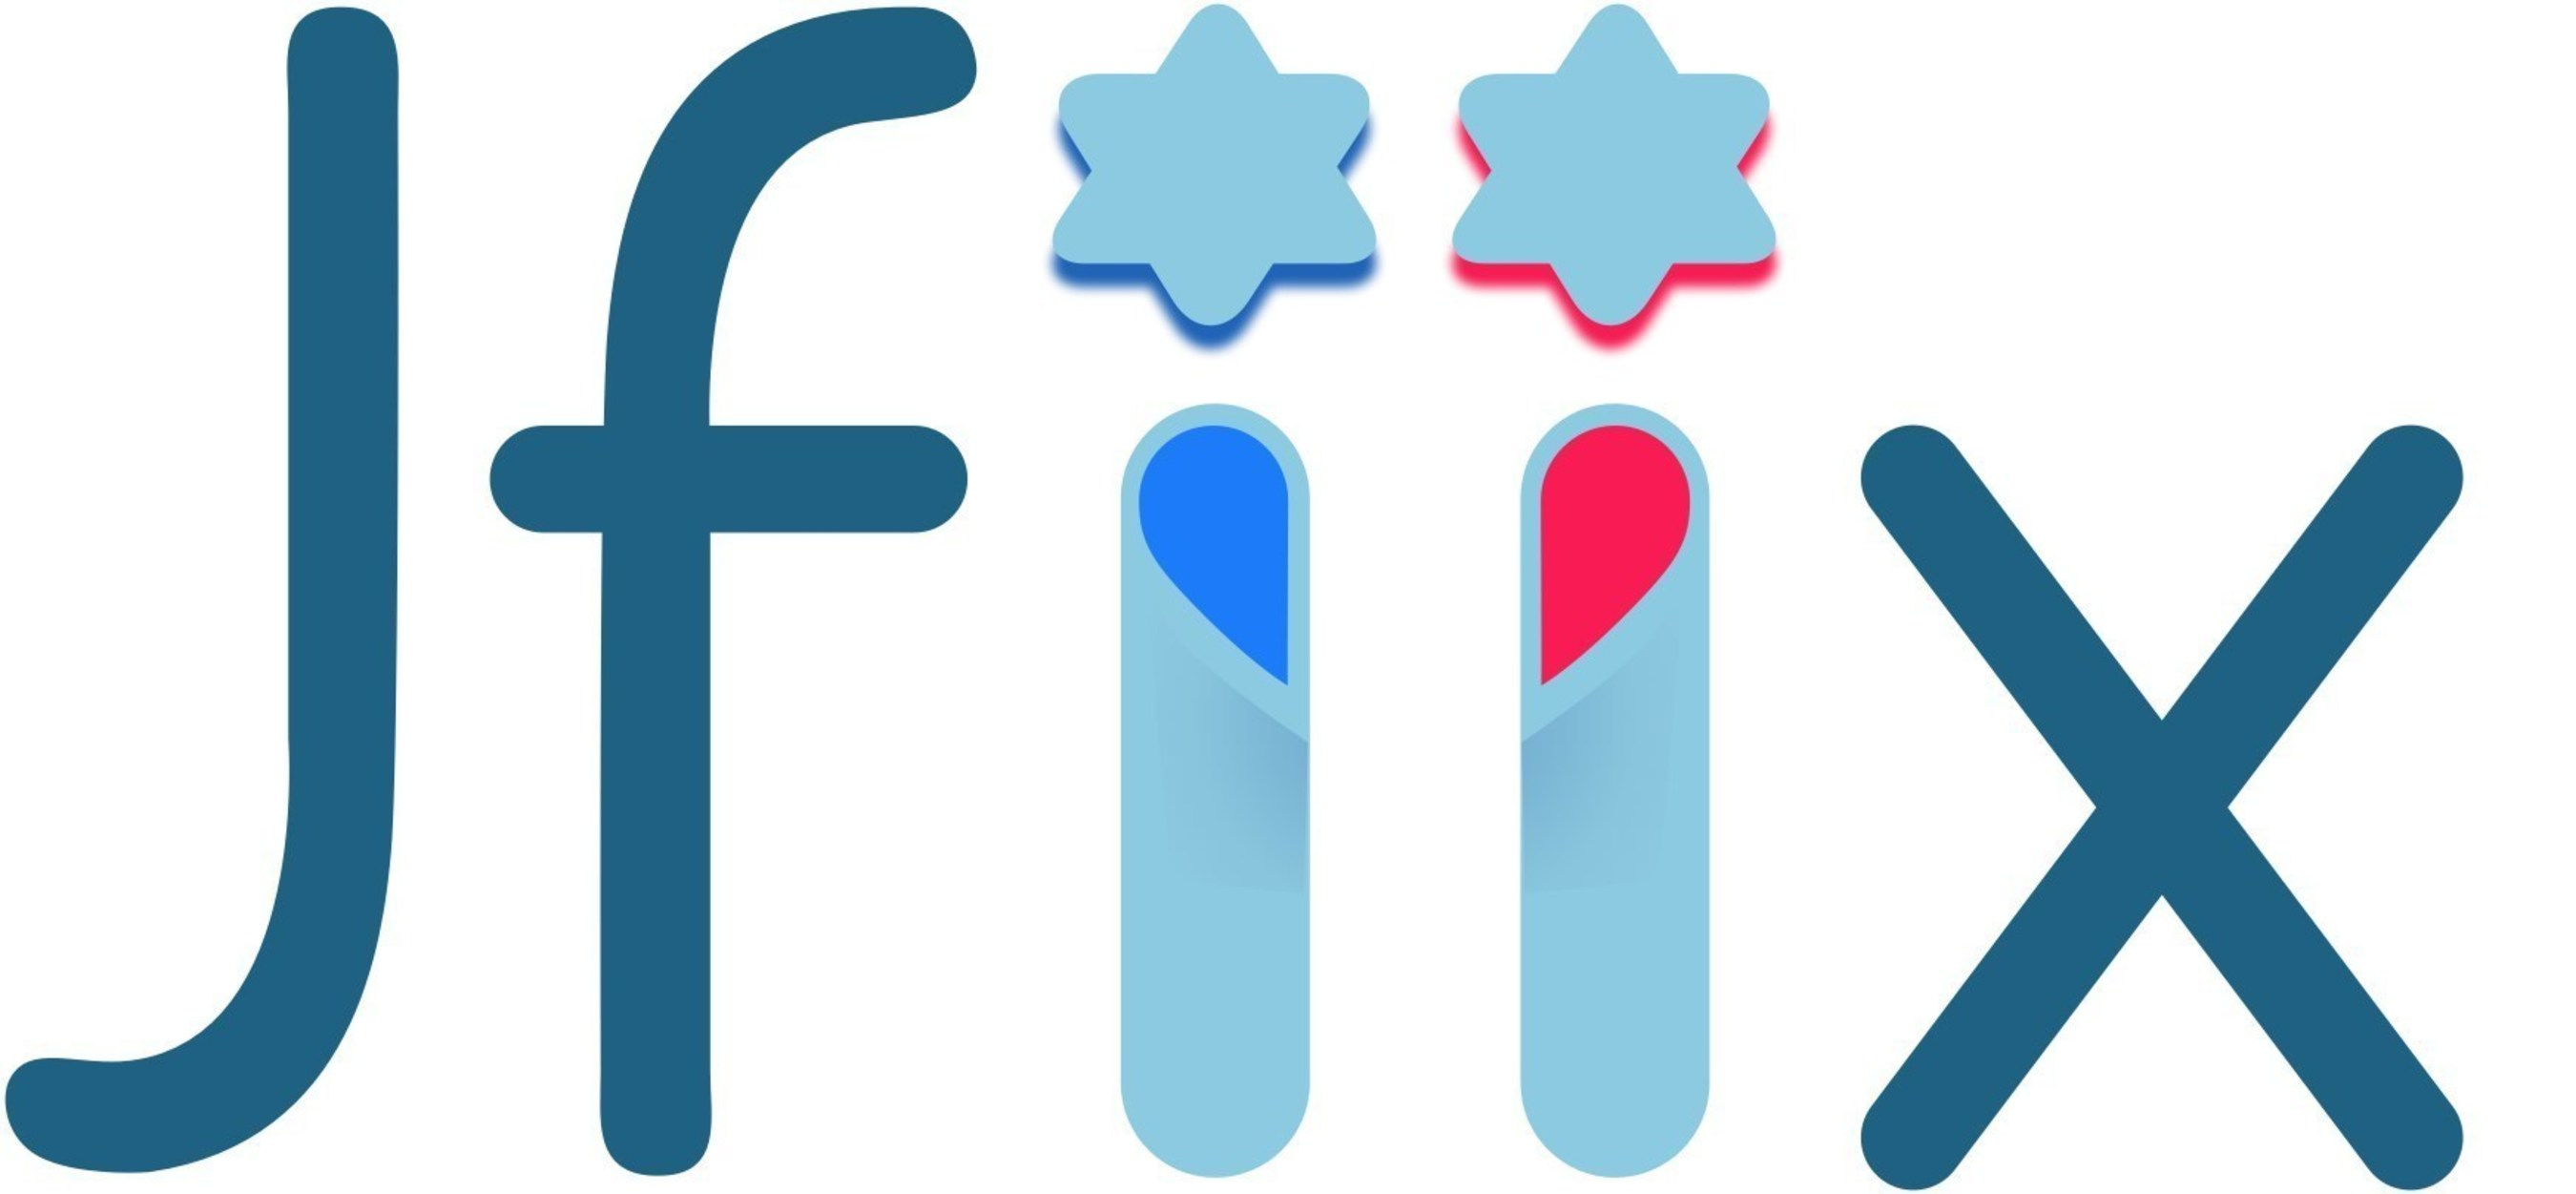 Jfiix logo